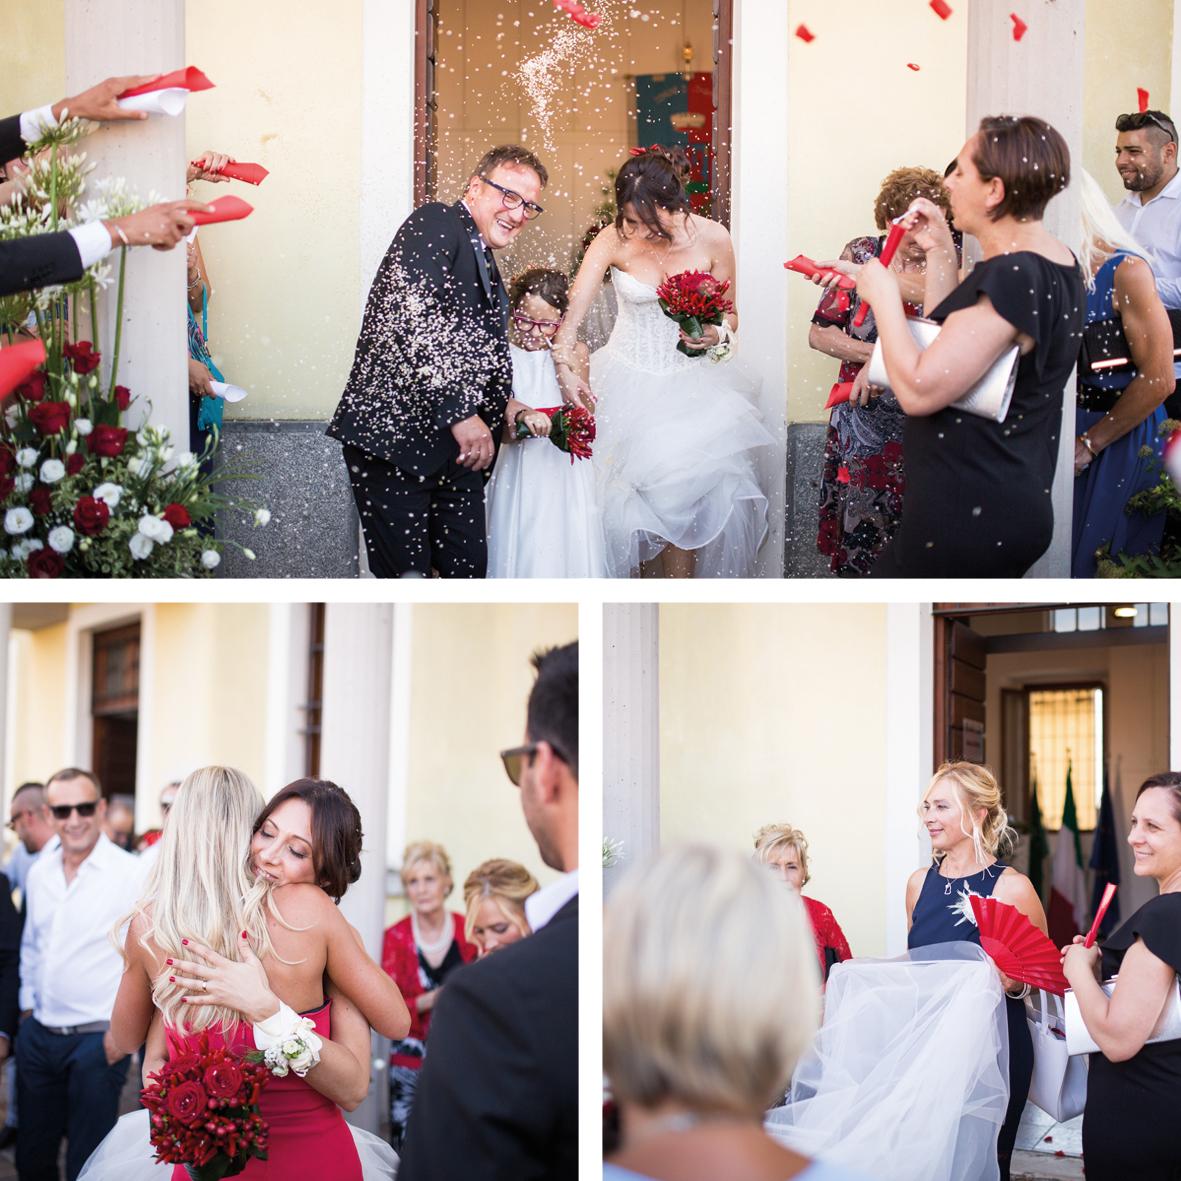 Fotografo matrimonio Brescia wedding reportage Fabiana e Giorgio7